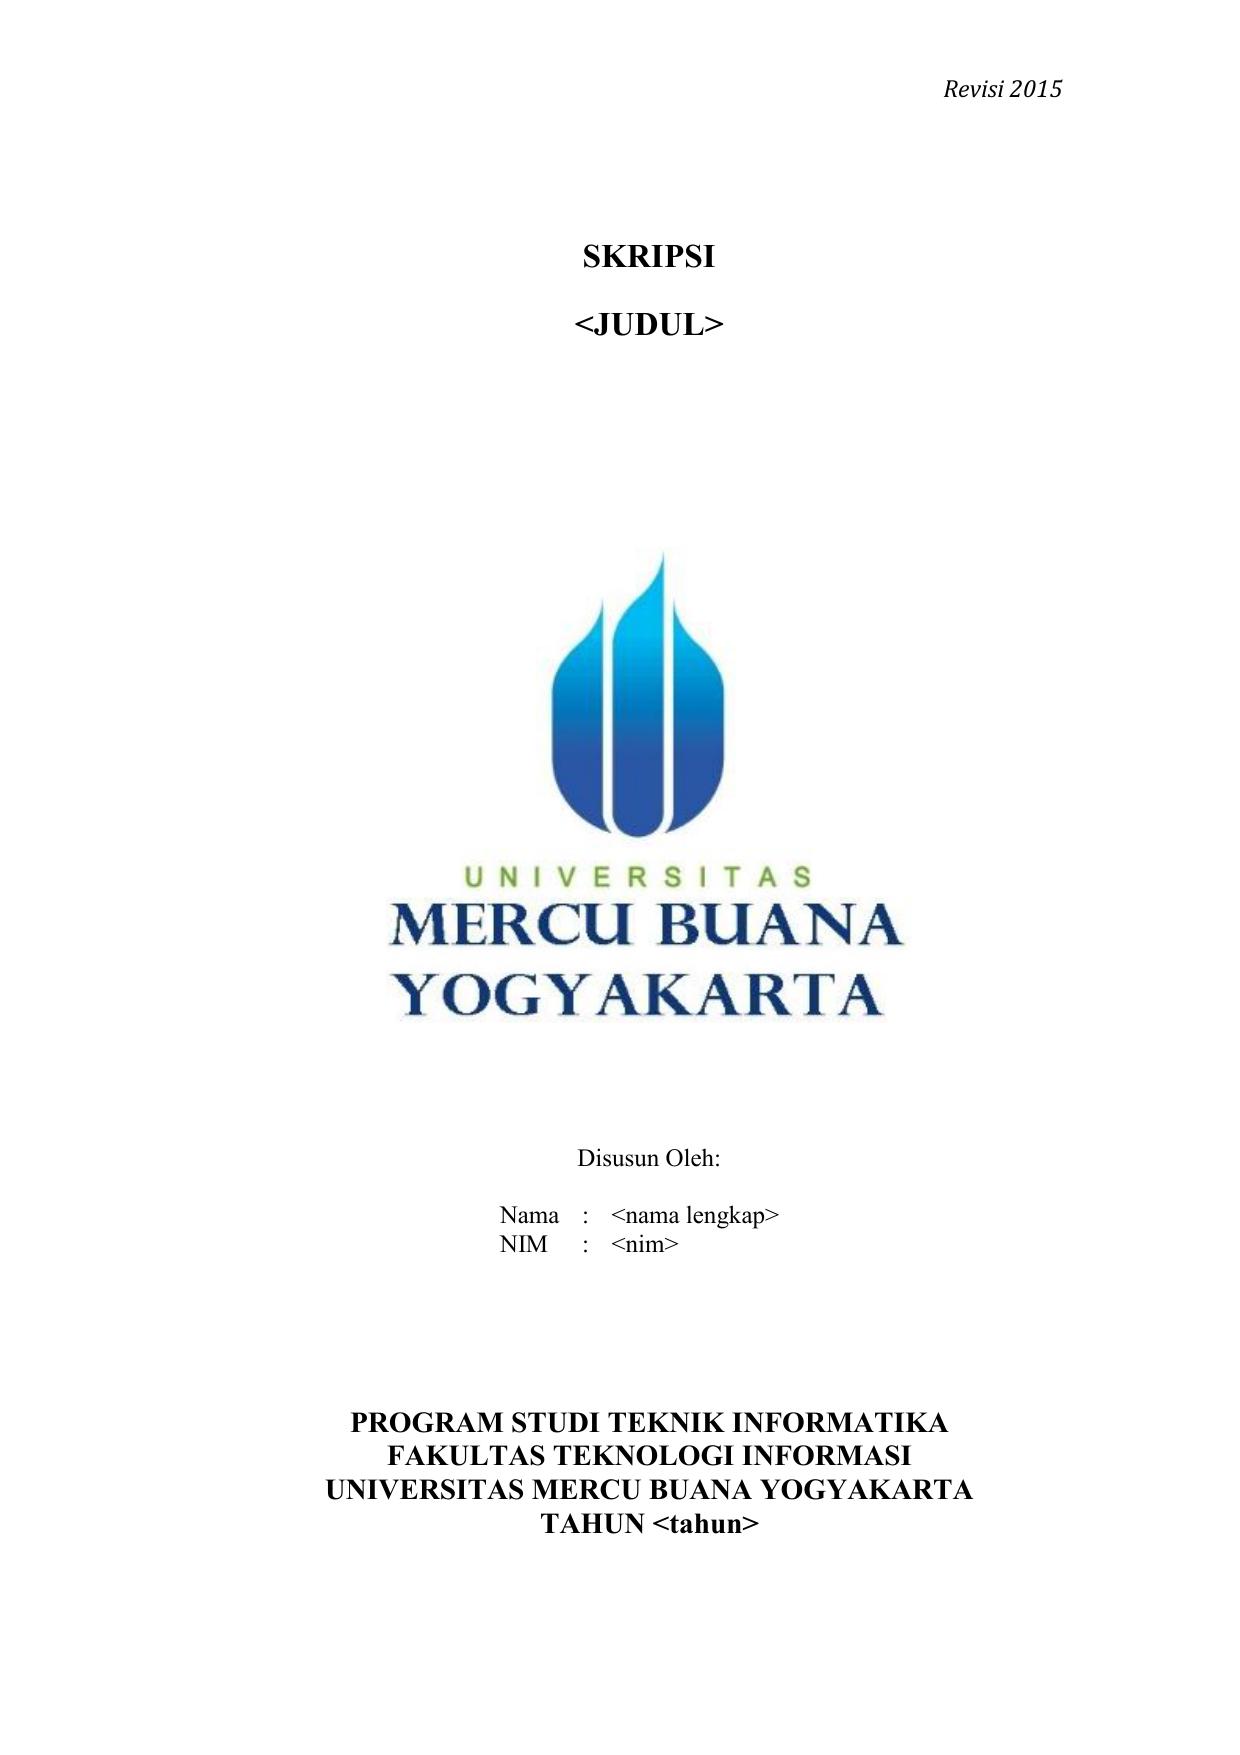 Skripsi Universitas Mercu Buana Yogyakarta